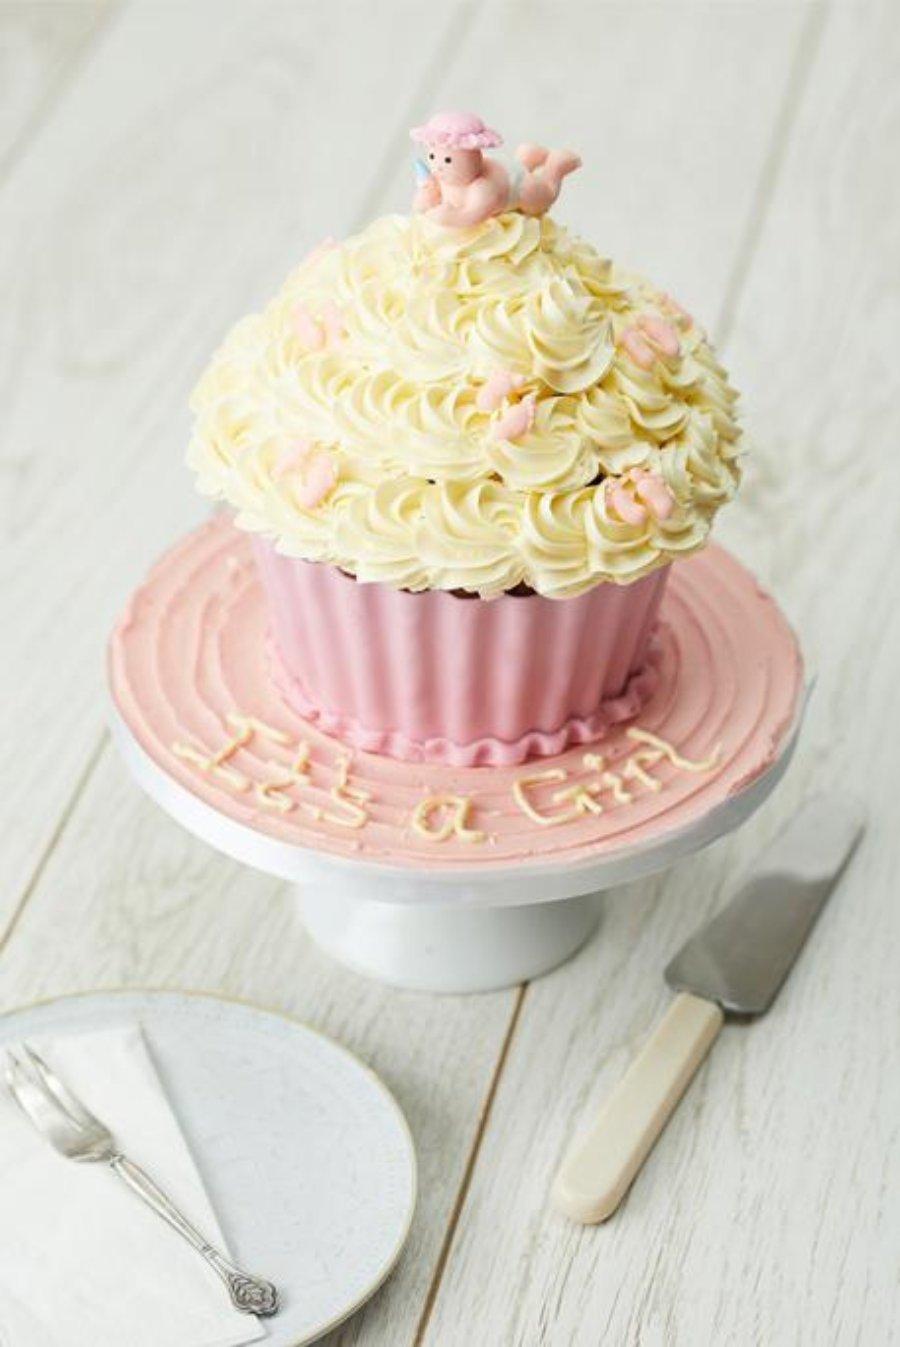 How To Make a Giant cupcake!